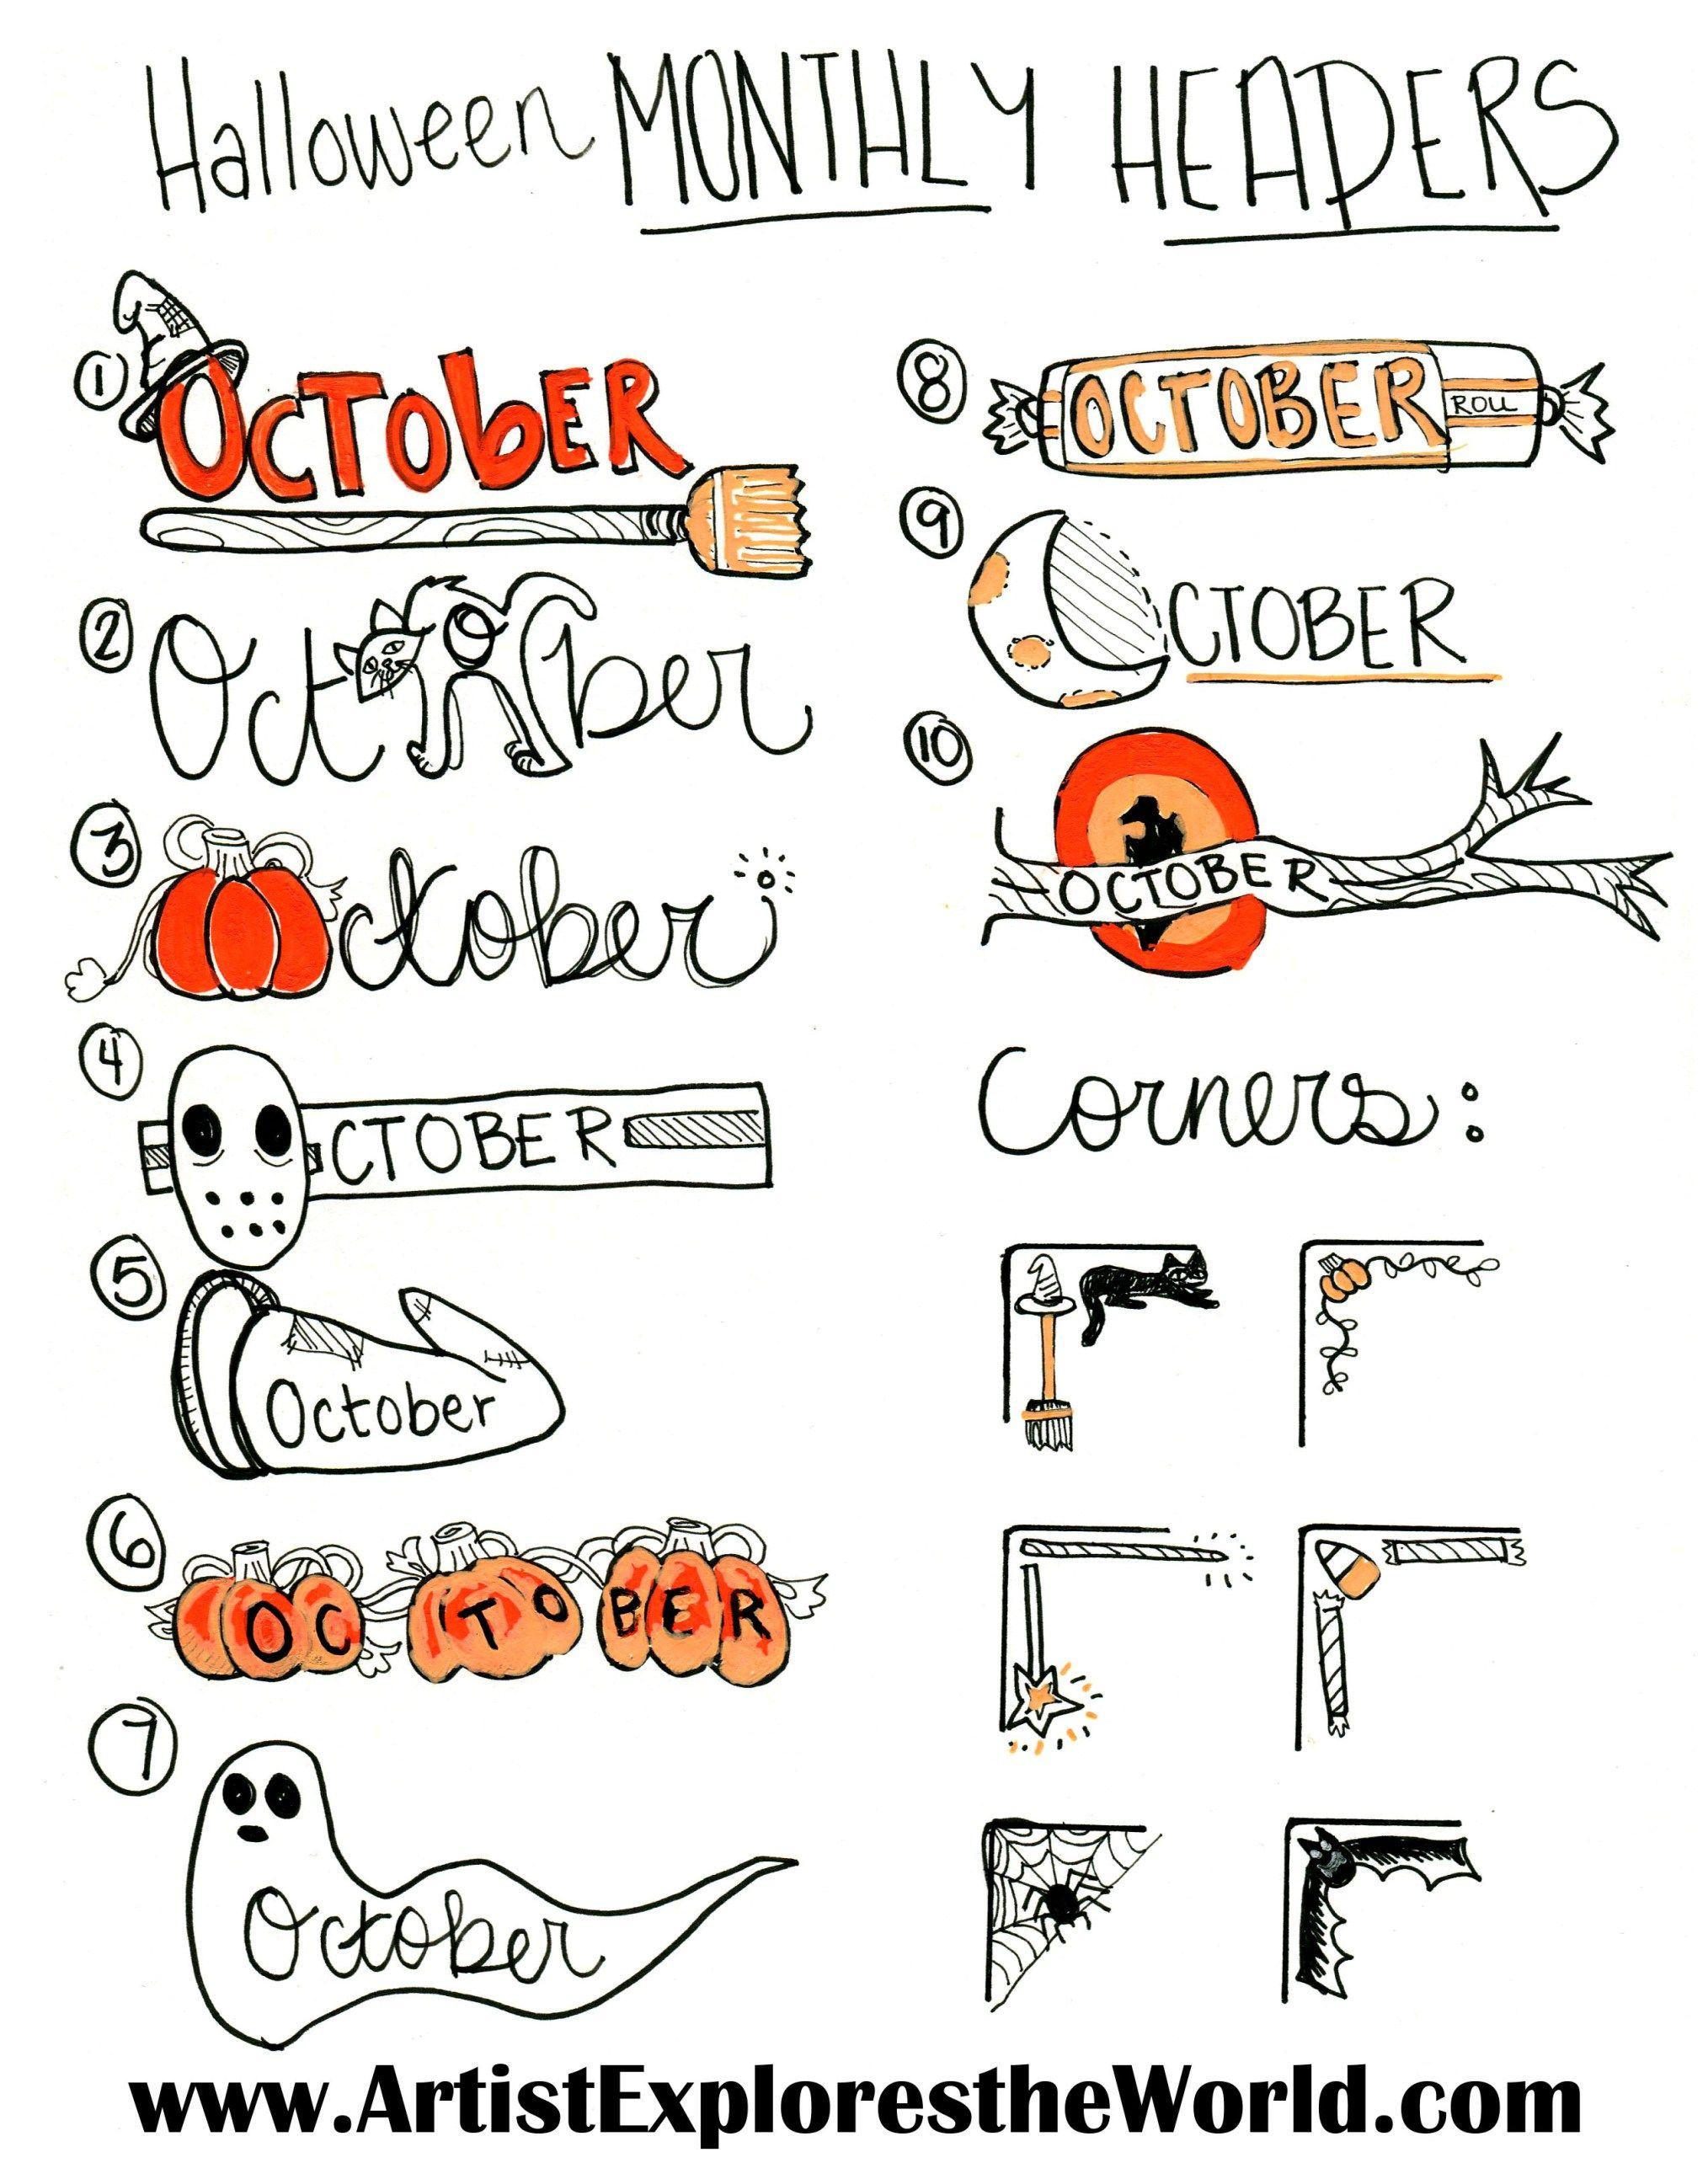 Halloweenheadersandicons journaling pinterest bullet